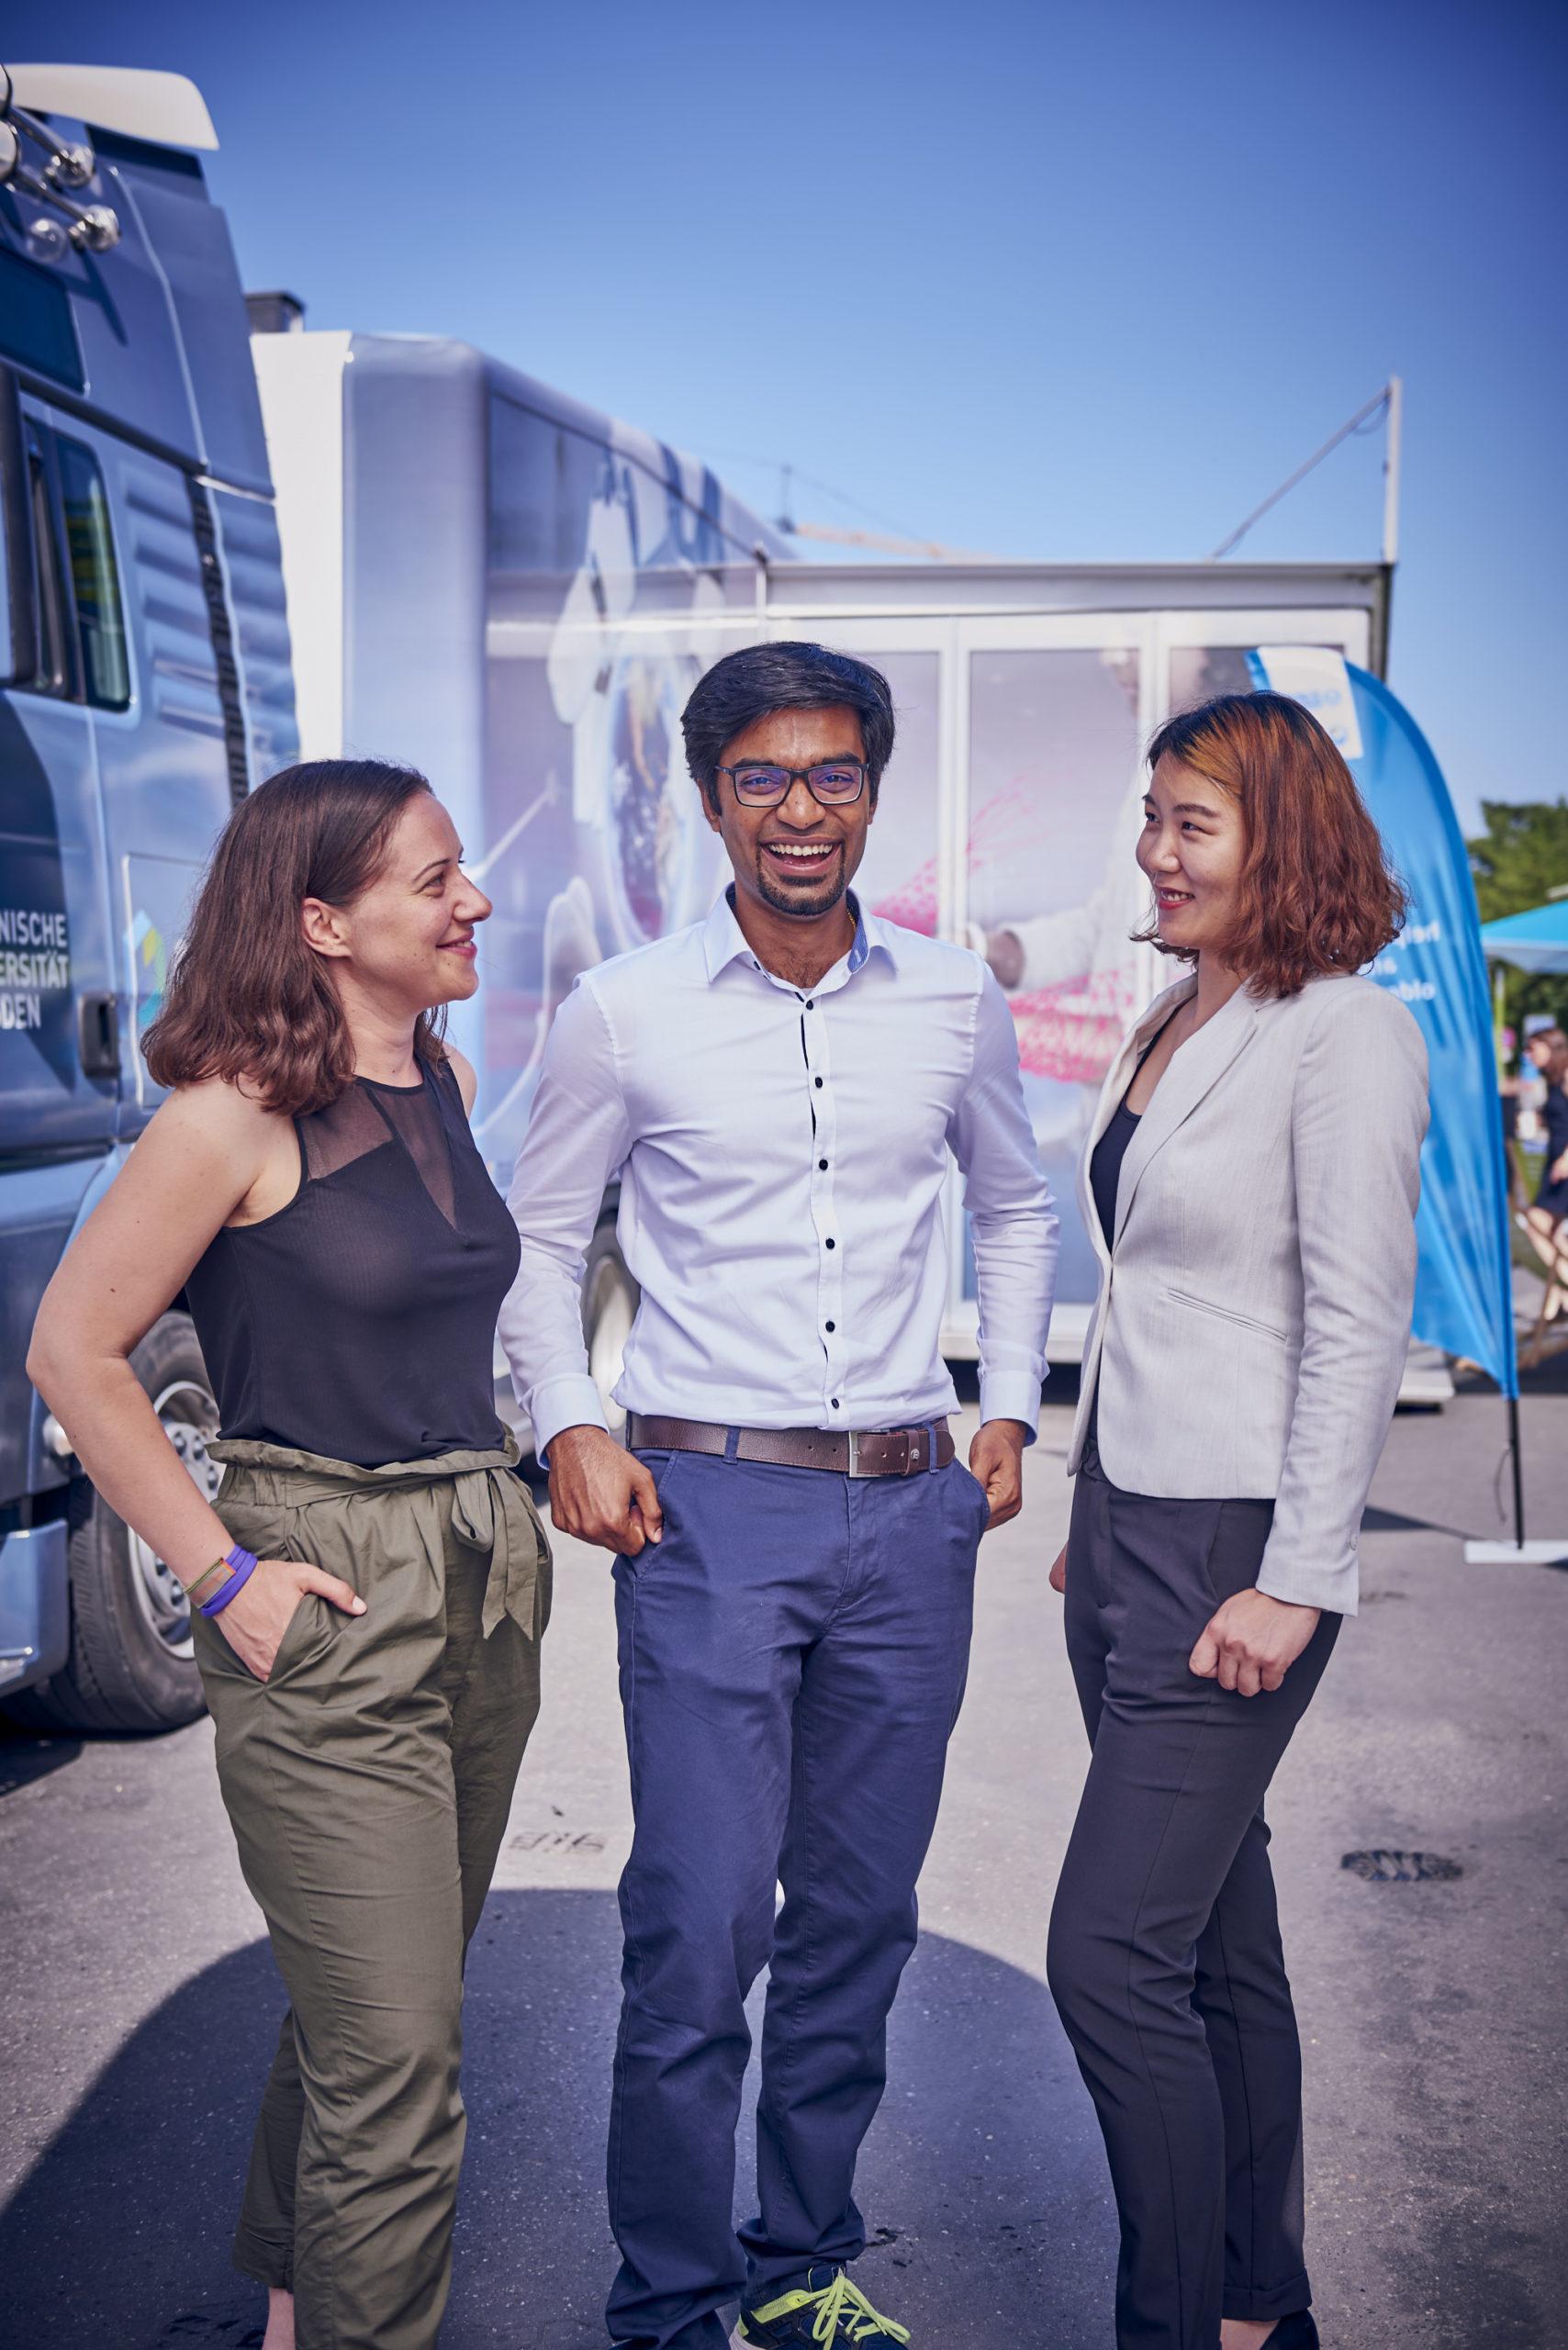 3 CeTI team members in front of the CeTI truck